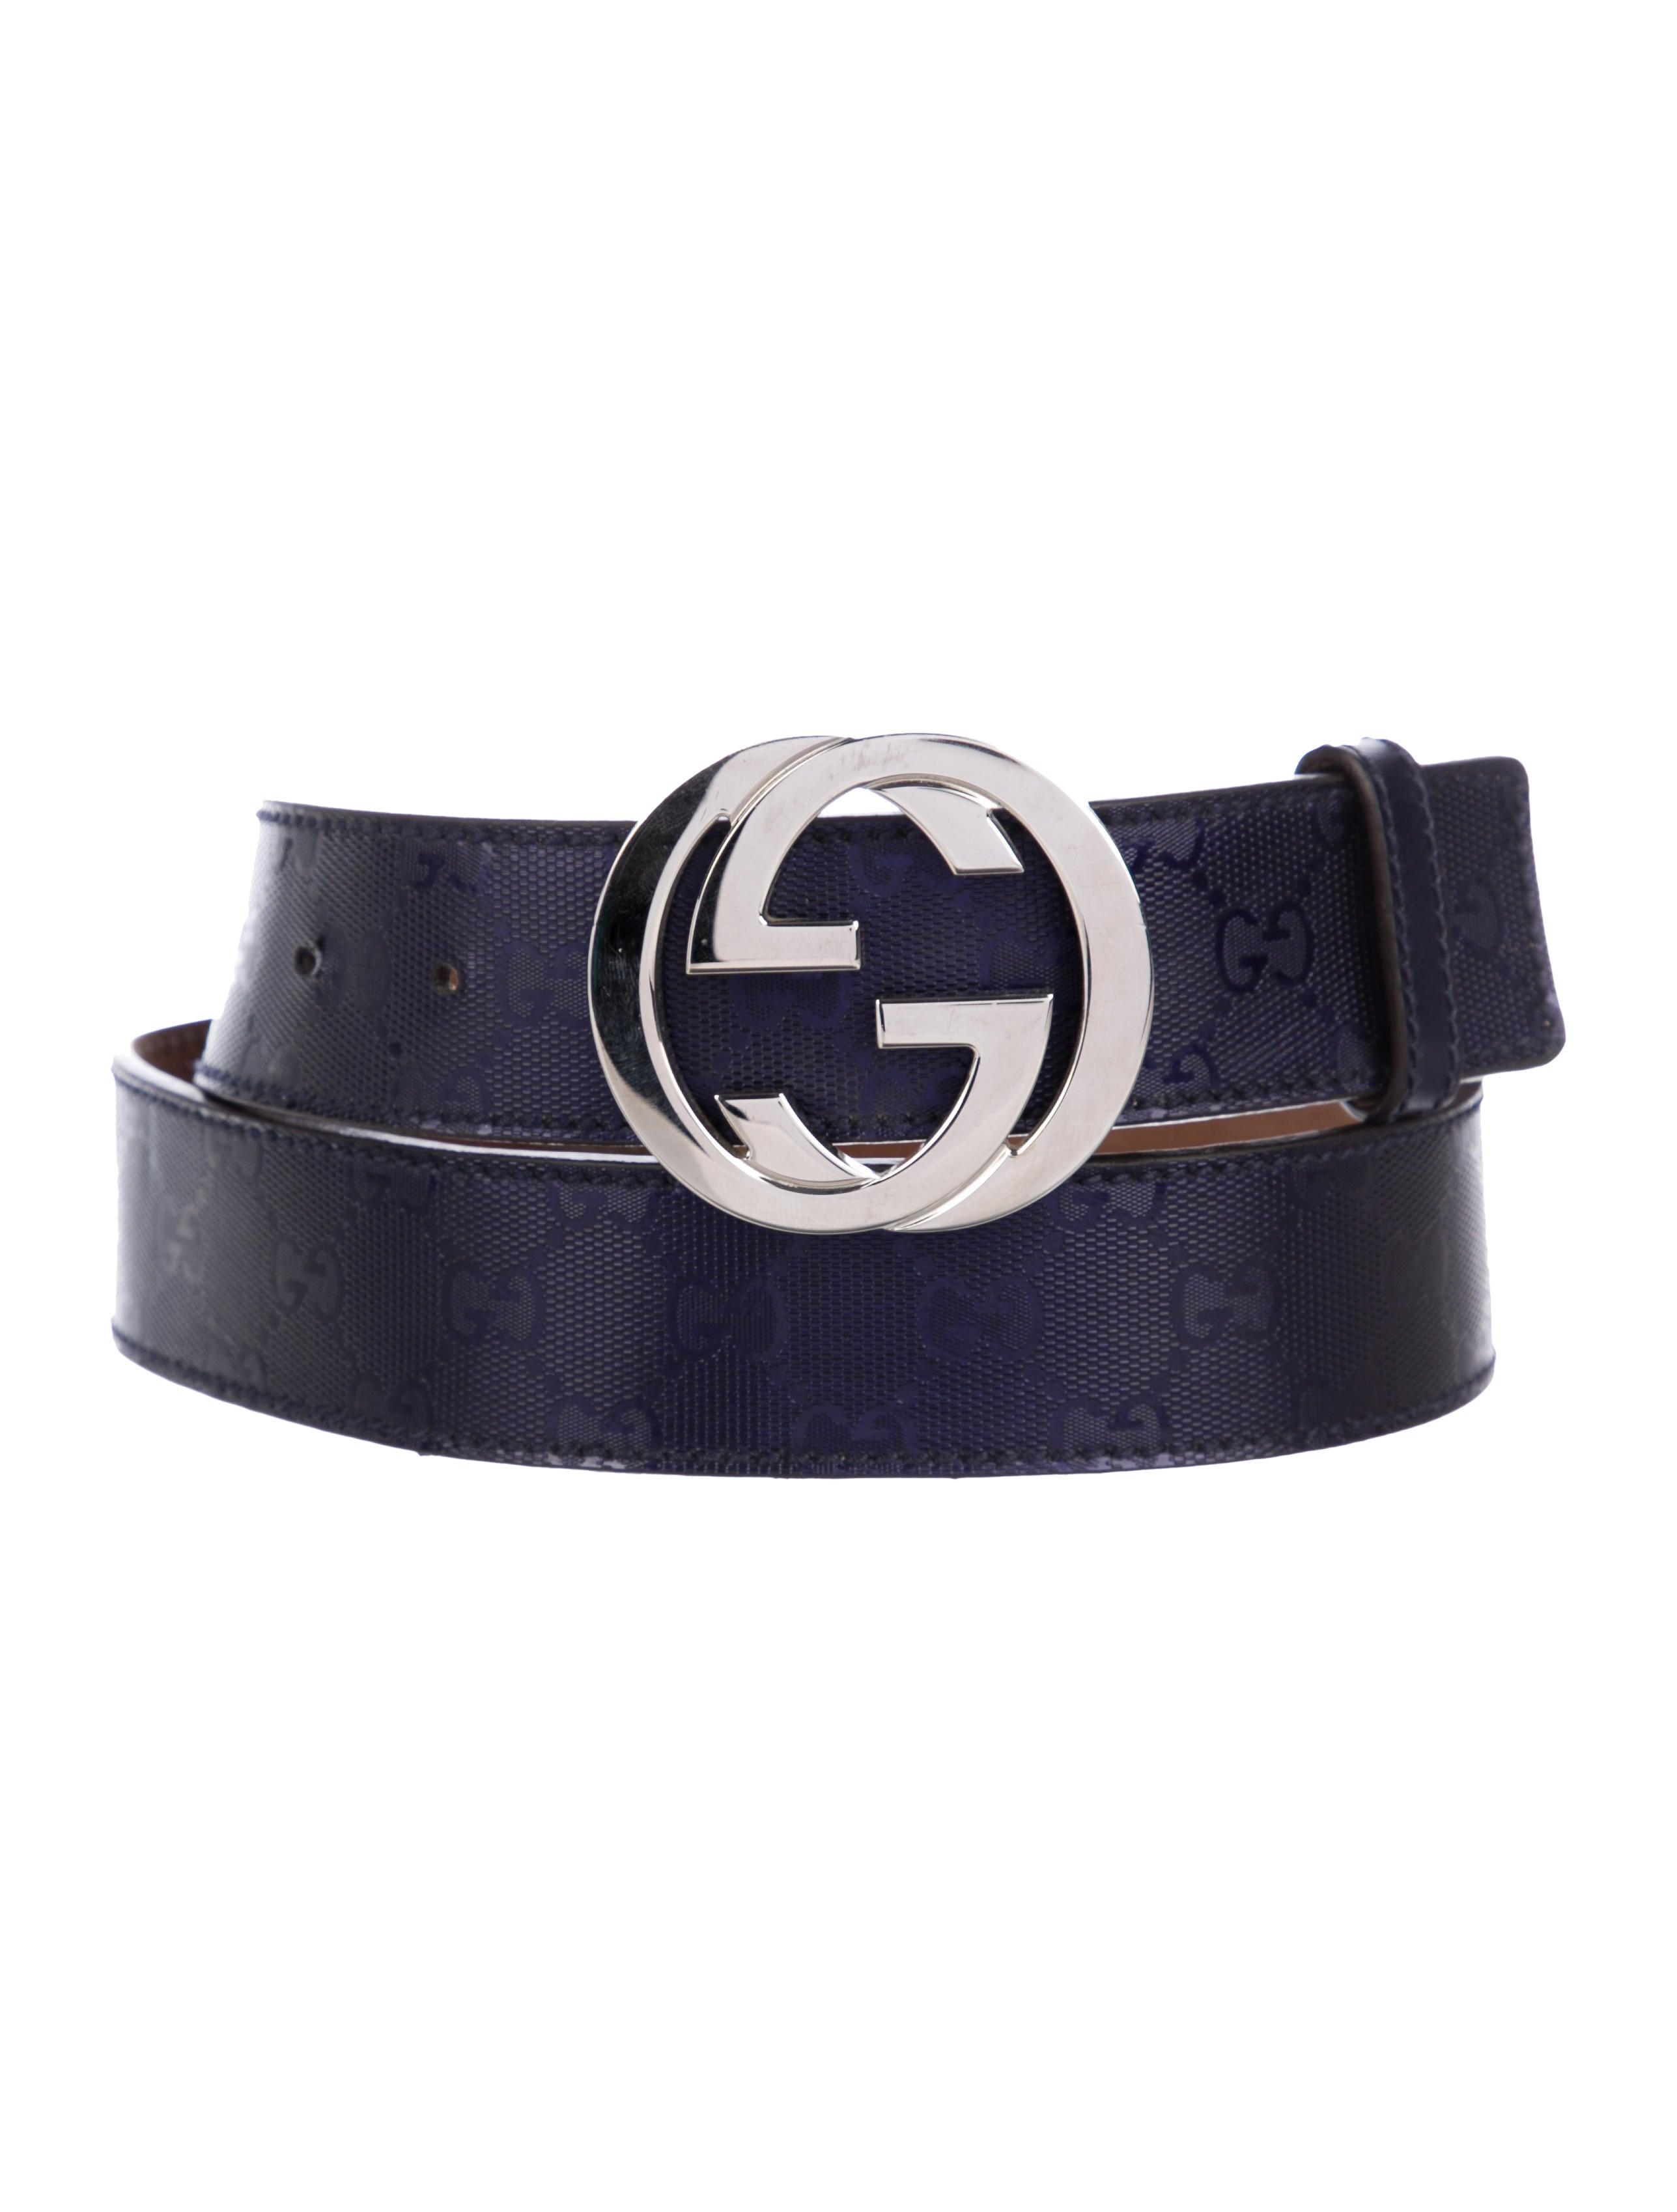 7ce5967bcc7 Gucci GG Imprimé Interlocking GG Belt - Accessories - GUC276388 ...